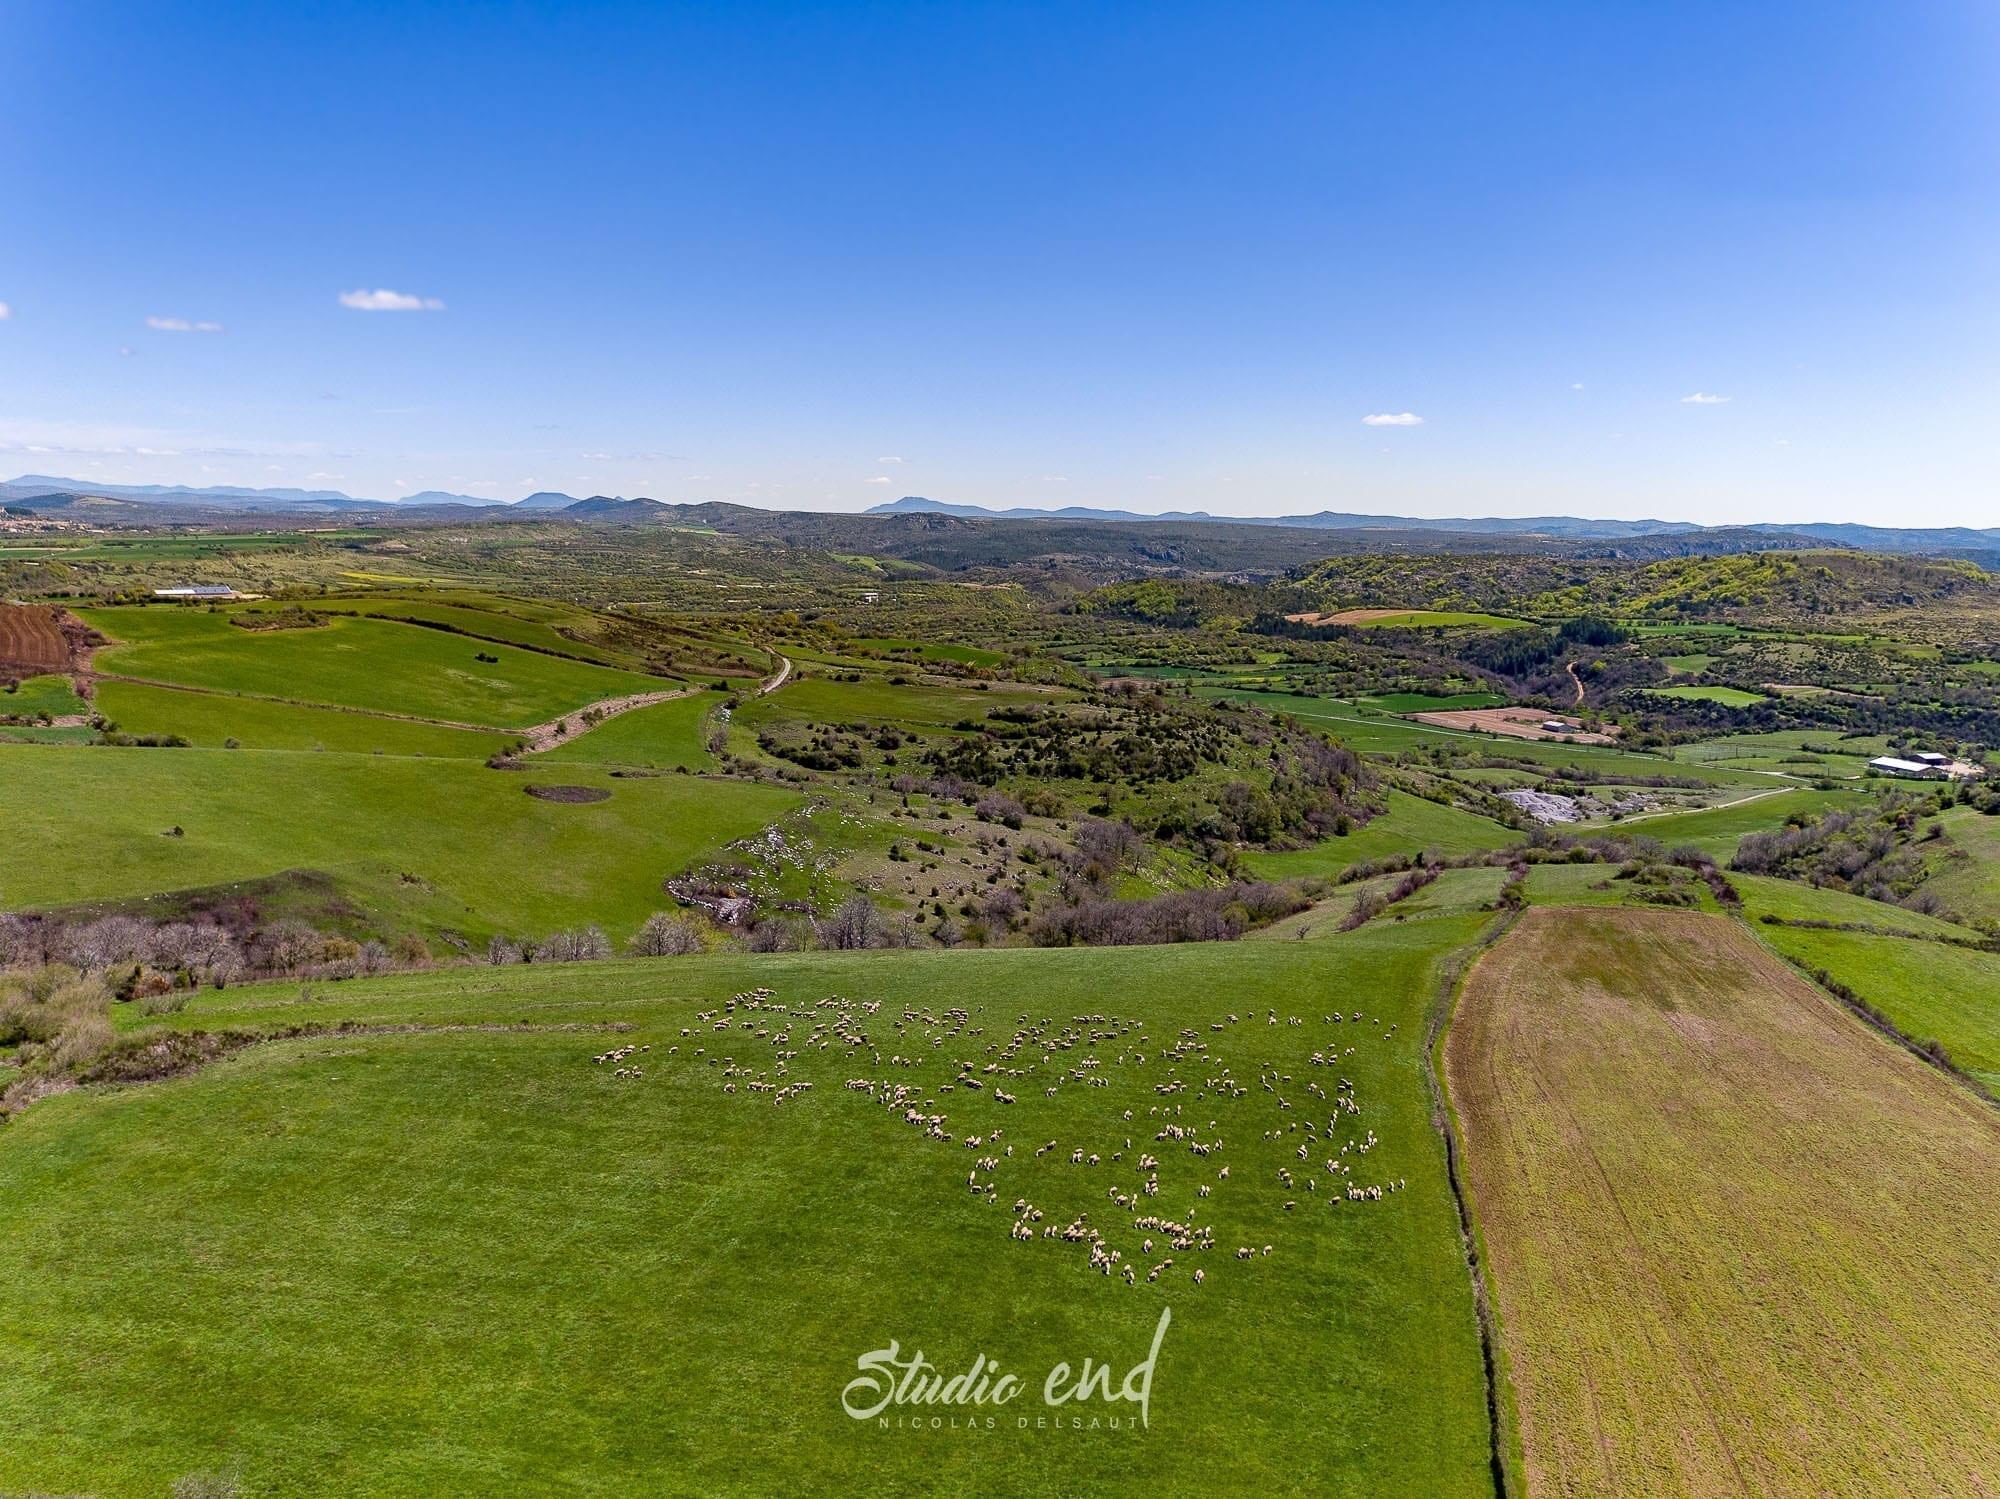 Photographe drone Studio End en Aveyron